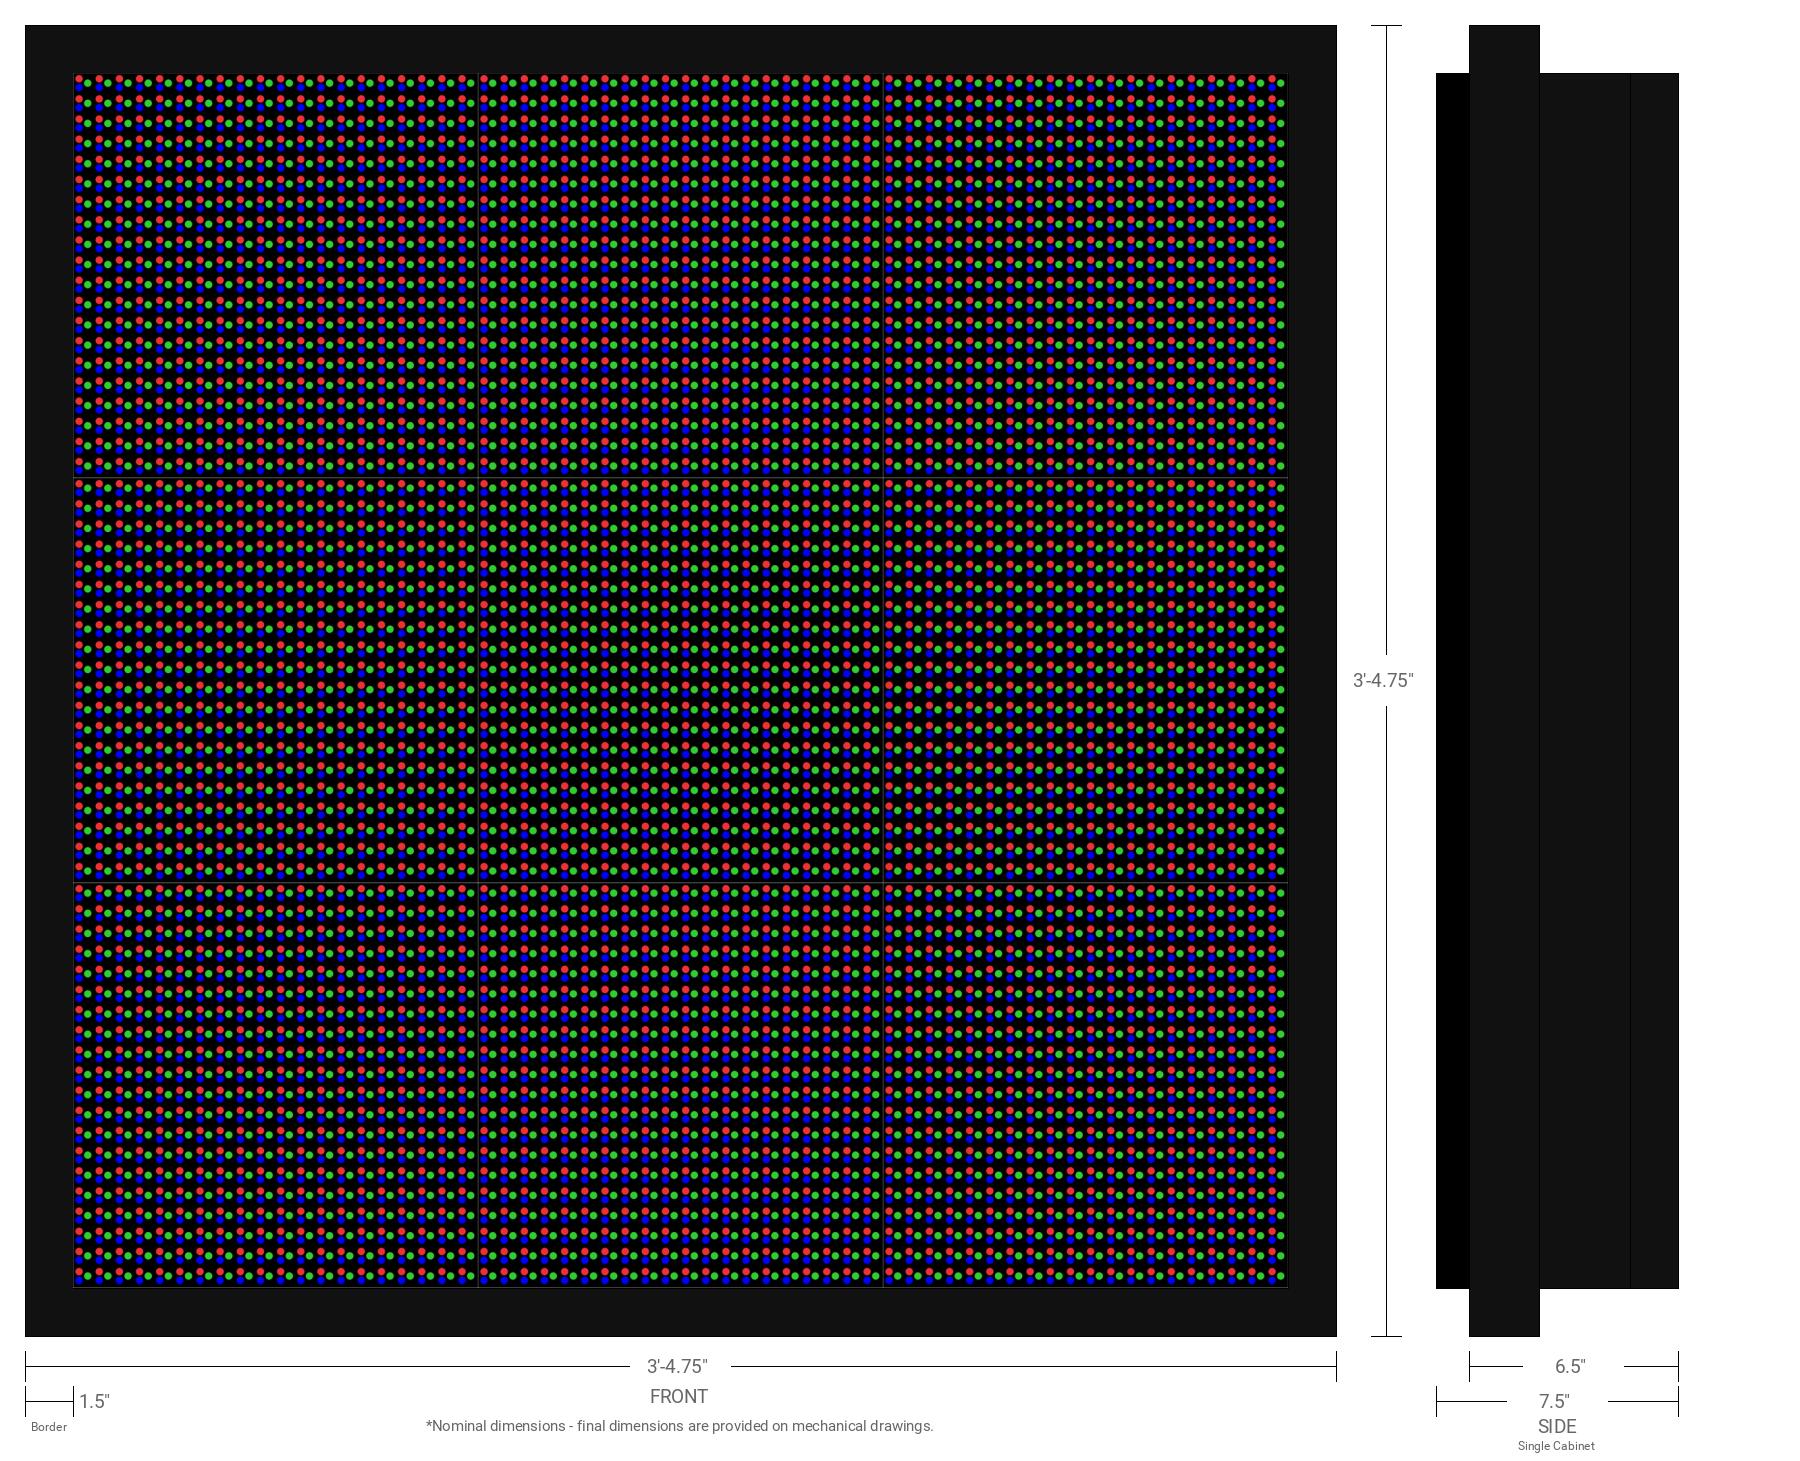 Aurora 16mm 60x60 Single Sided Full Color LED Display